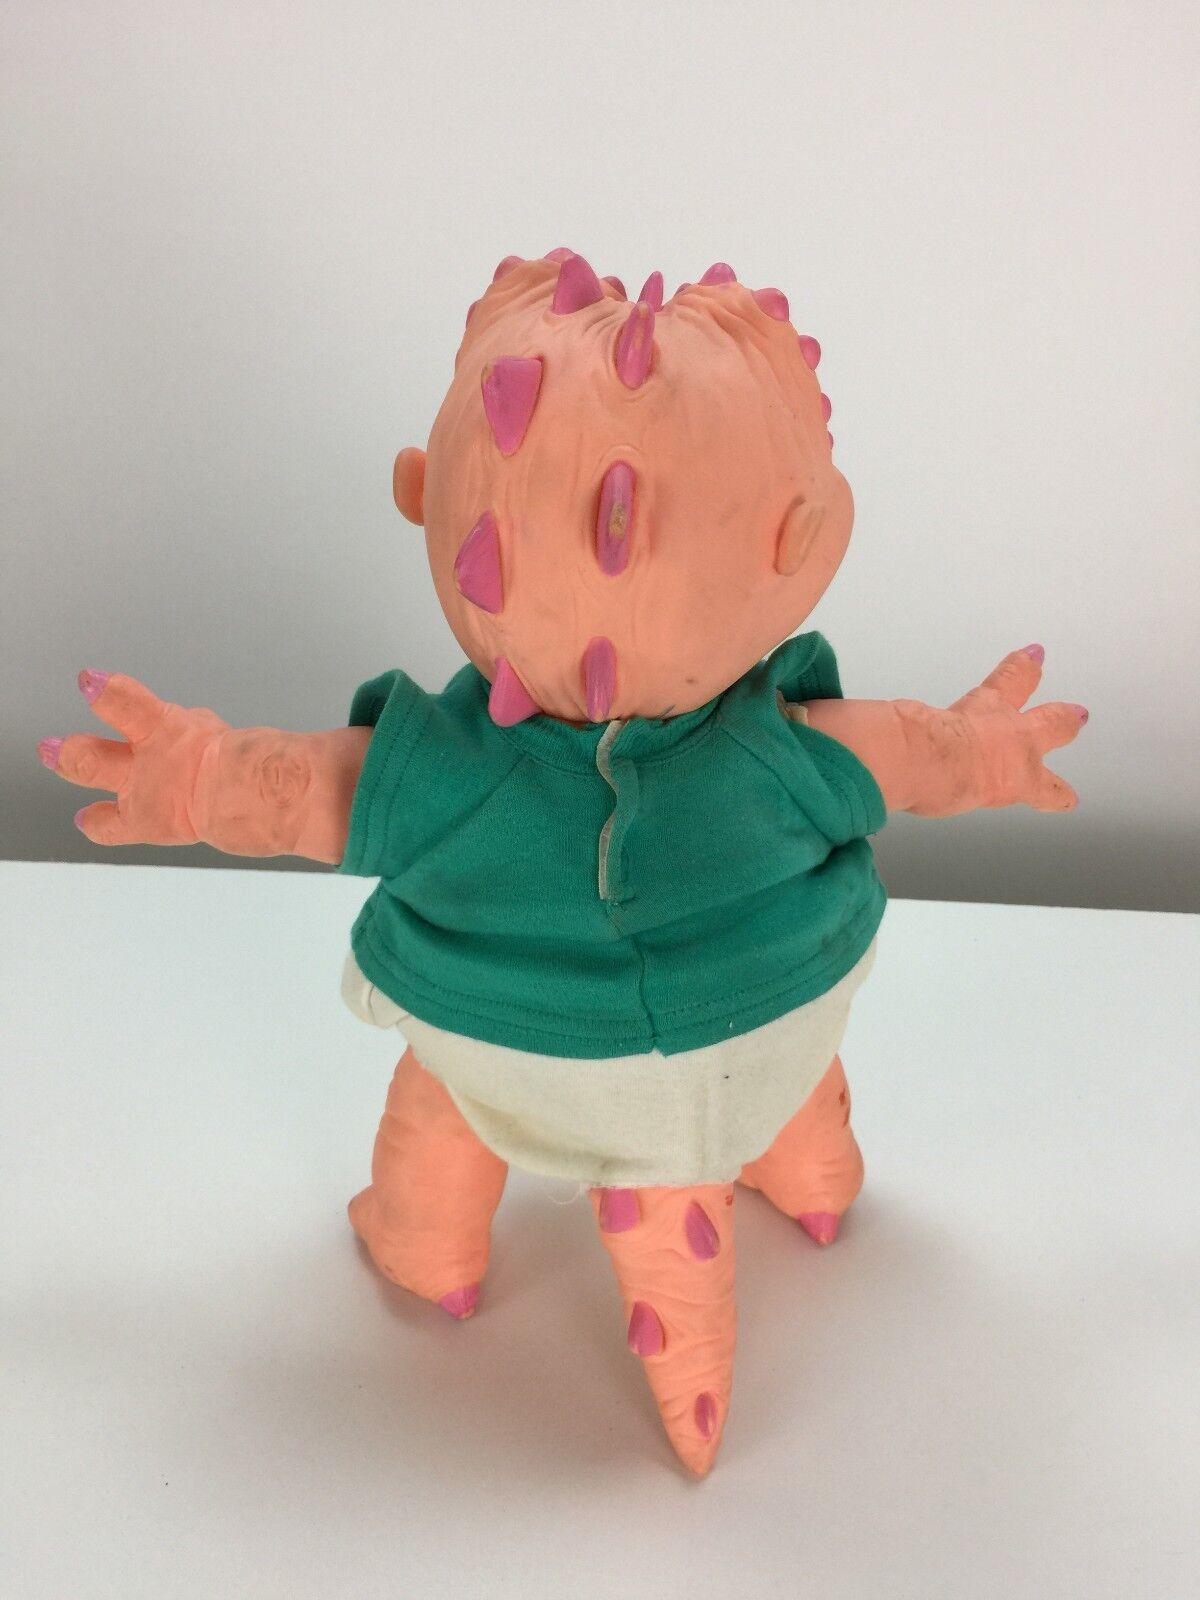 Baby Sinclair Dinosaurs Toy Doll Doll Doll 14  Plastic Plush VTG 90s TV Show Street Kids 1f78a6